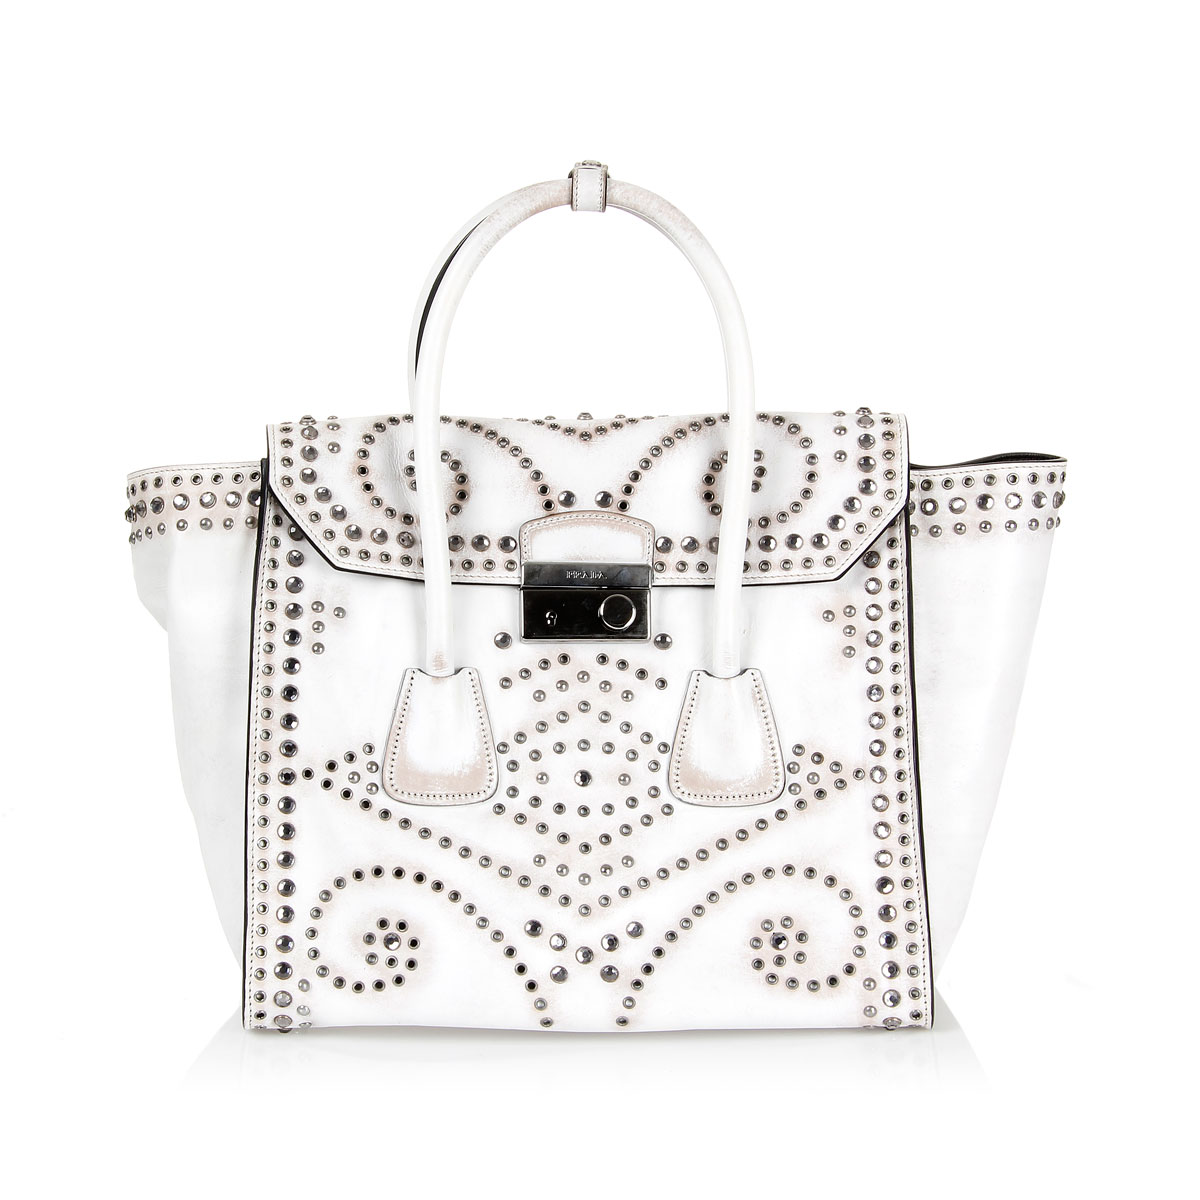 Prada Women Studded Leather shopping bag vintage effect - Spence ...